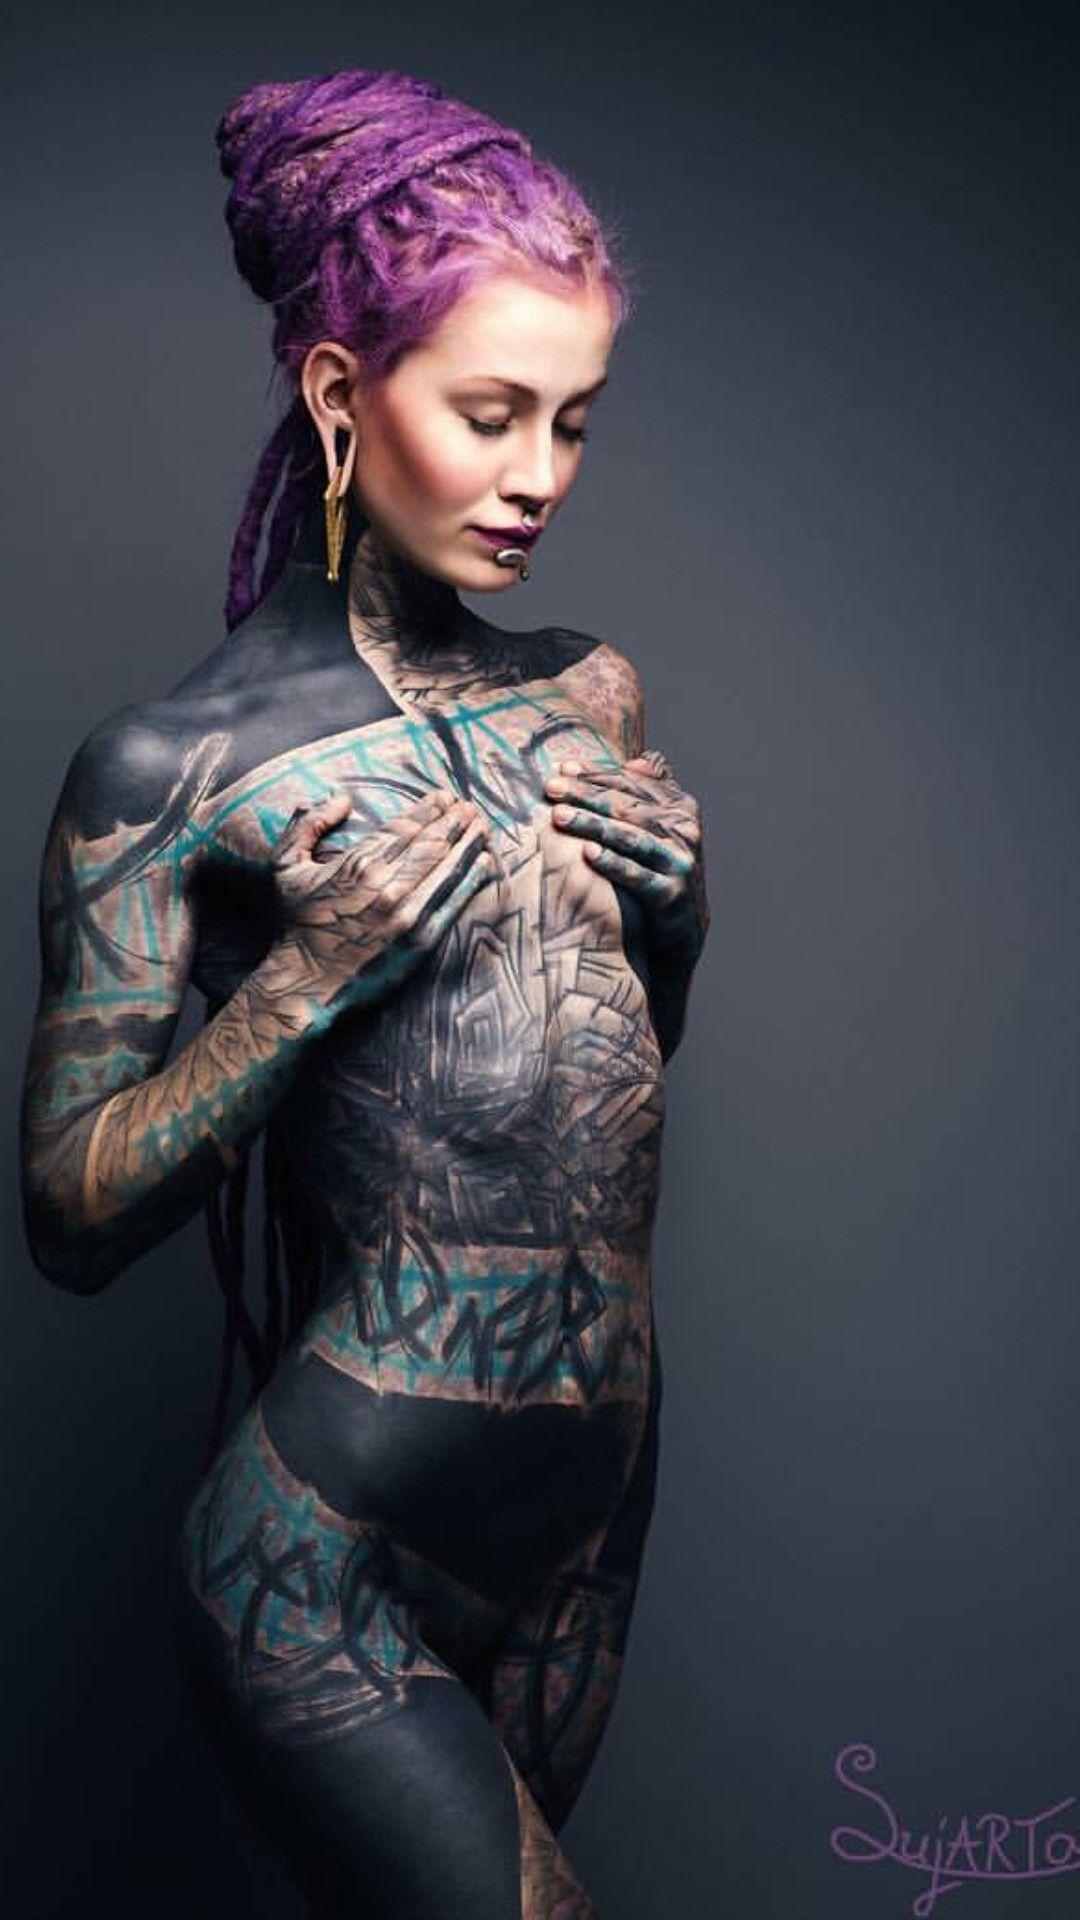 full body tattoos | Girl tattoos, Tattoo photography, Body